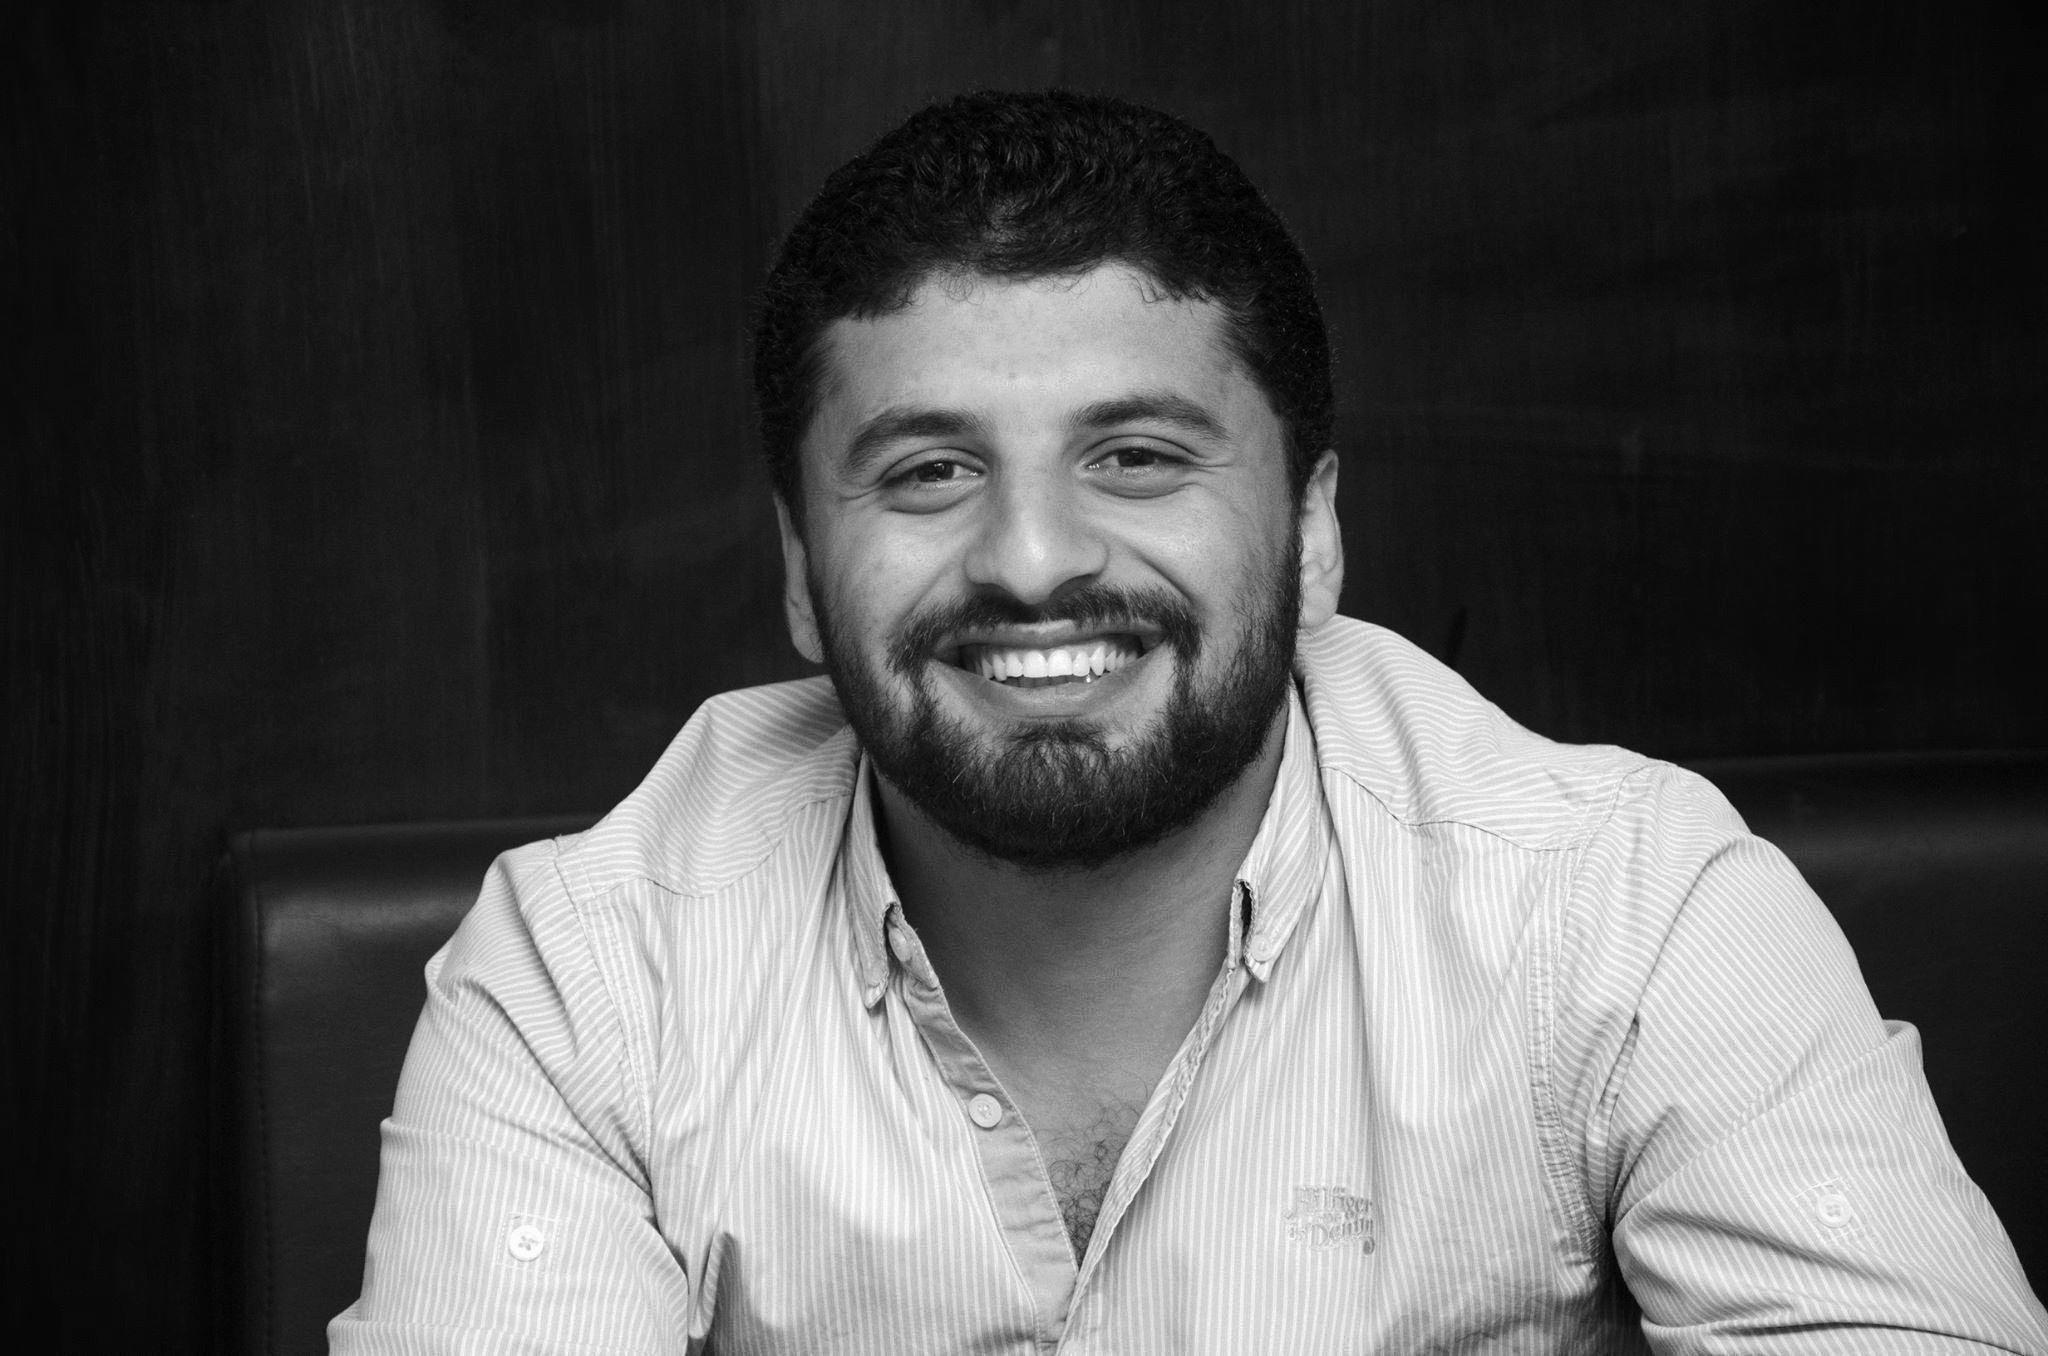 خالد أحمد رضا Headshot